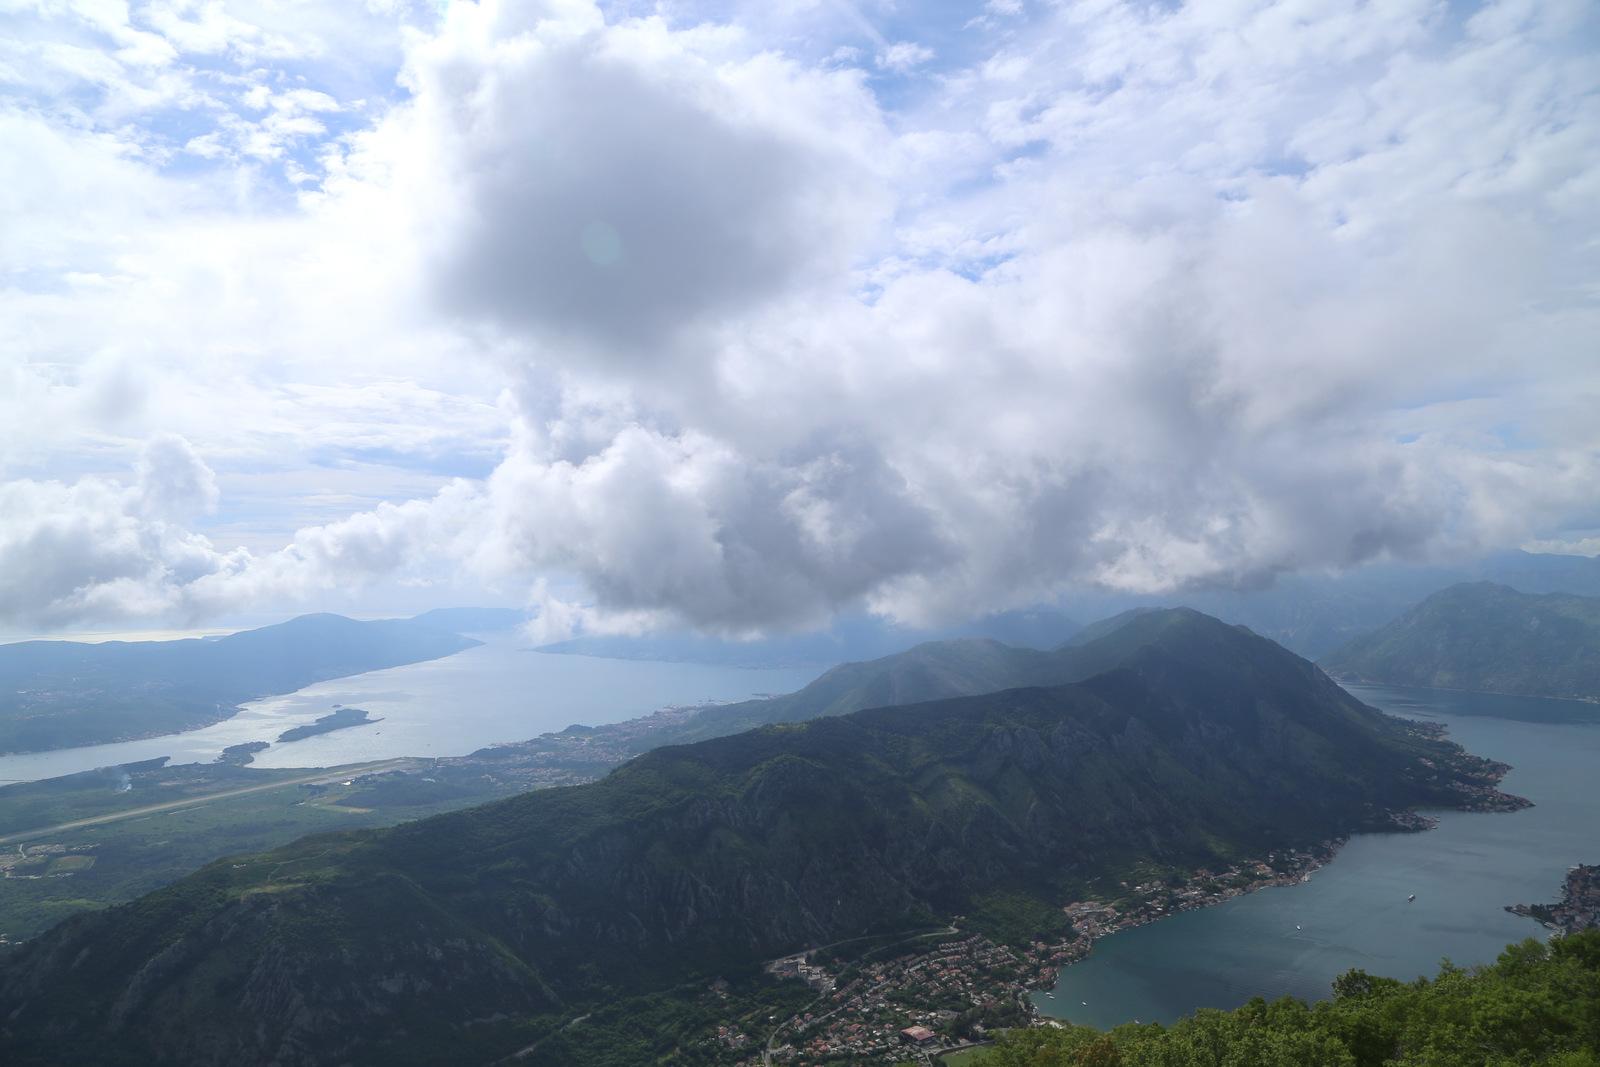 Lovcen-Kotor road